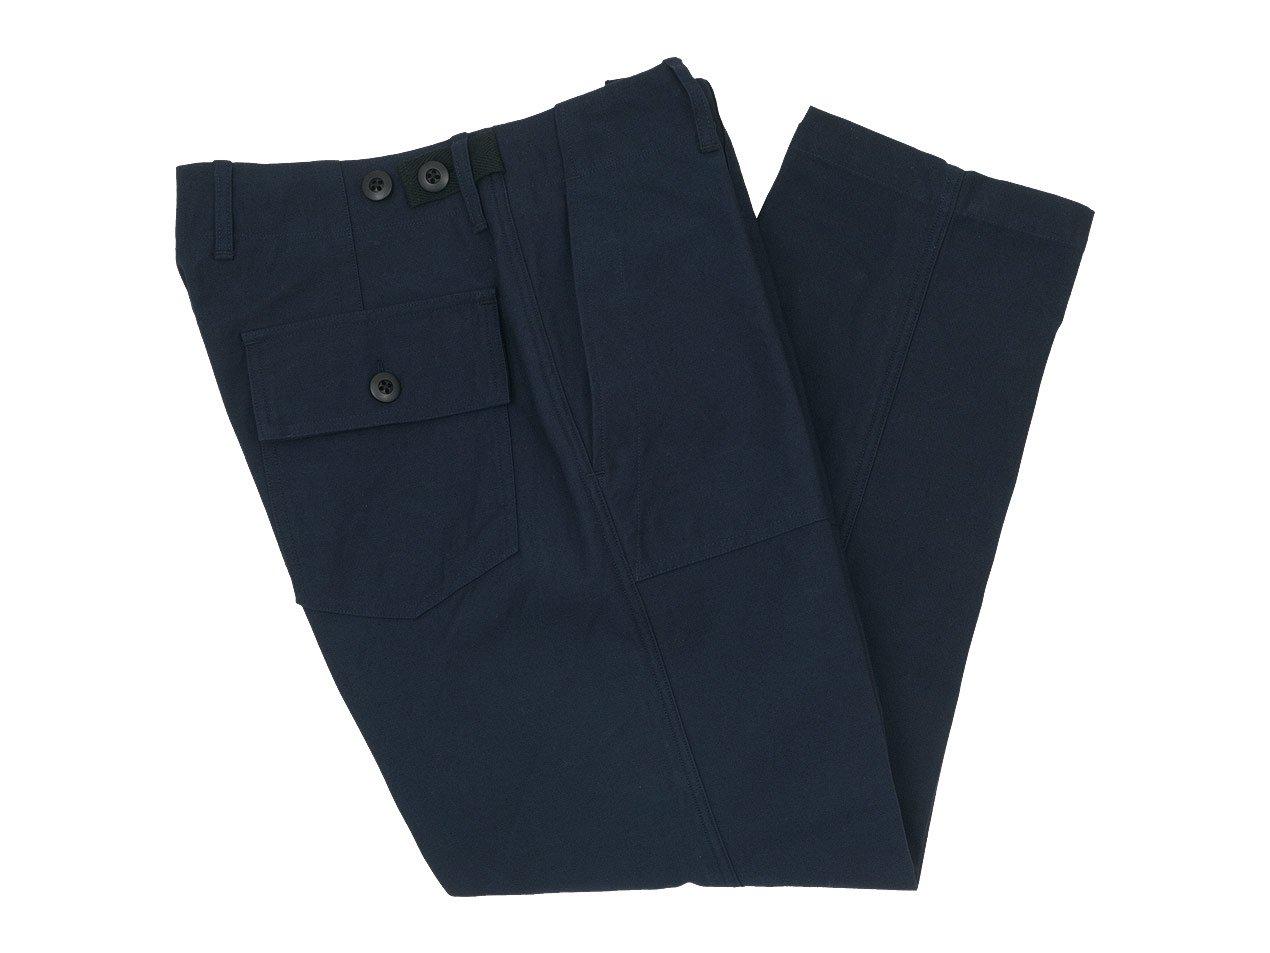 maillot military n/c baker pants NAVY